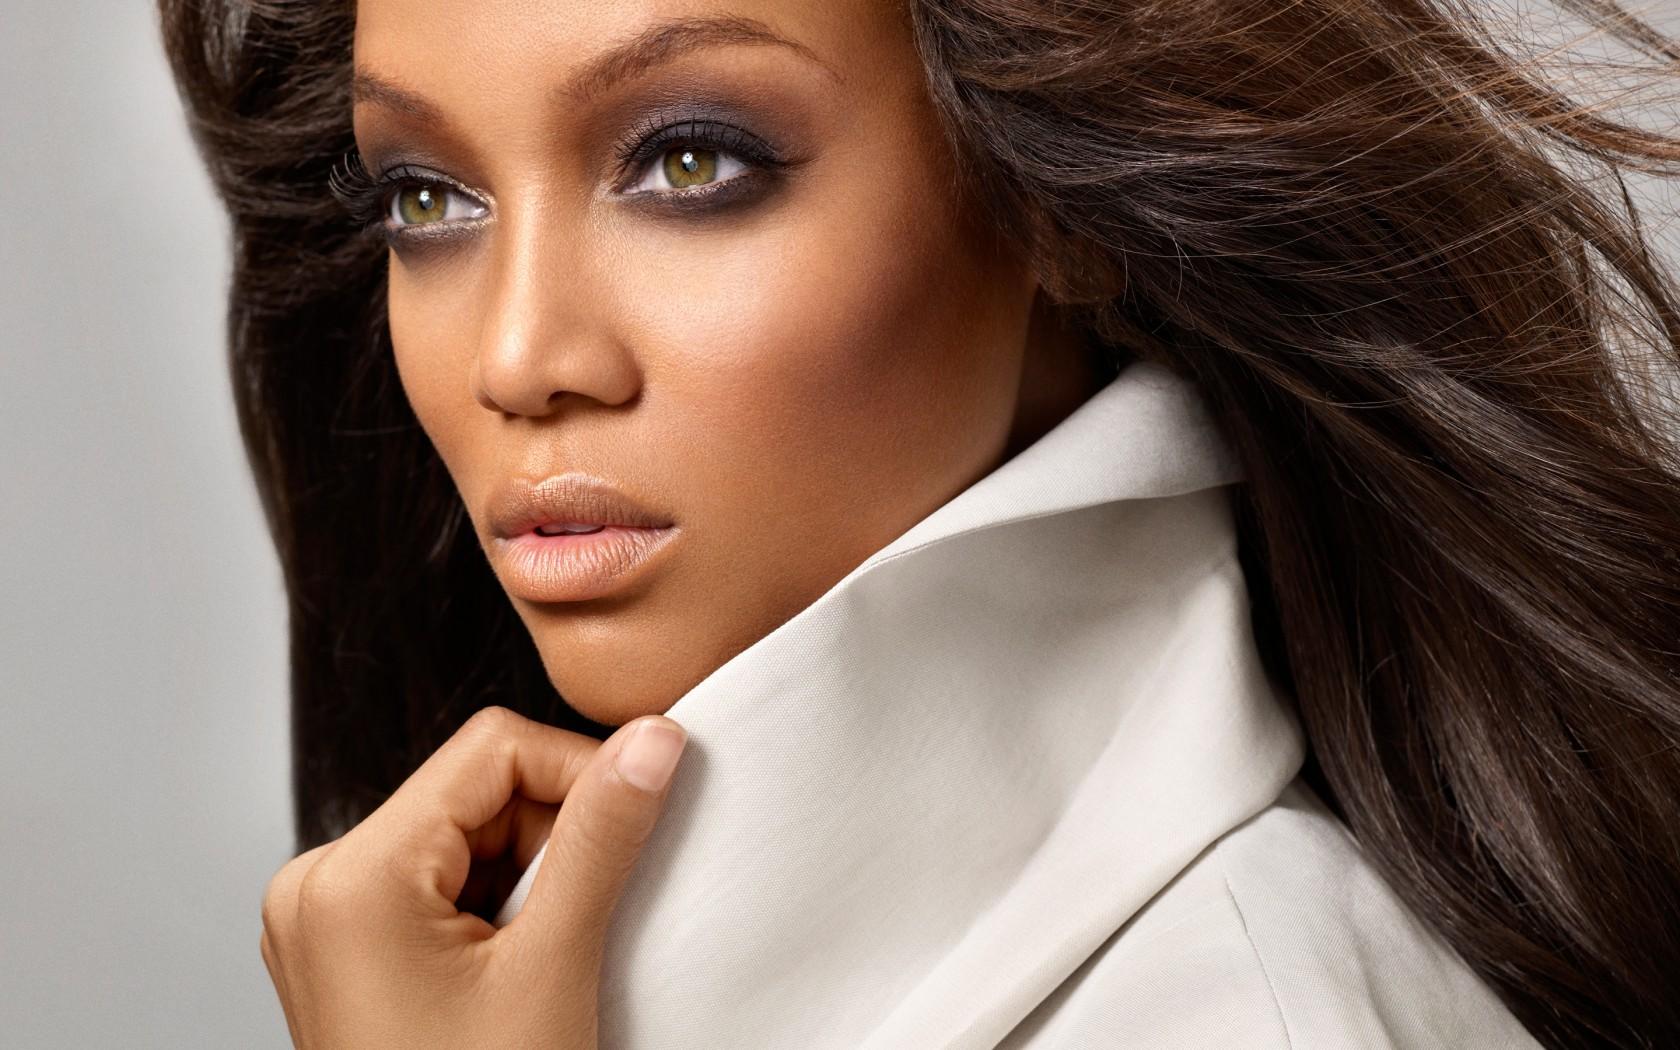 Black hair fashion models These Six Black Models Will Make Their Debut. - m